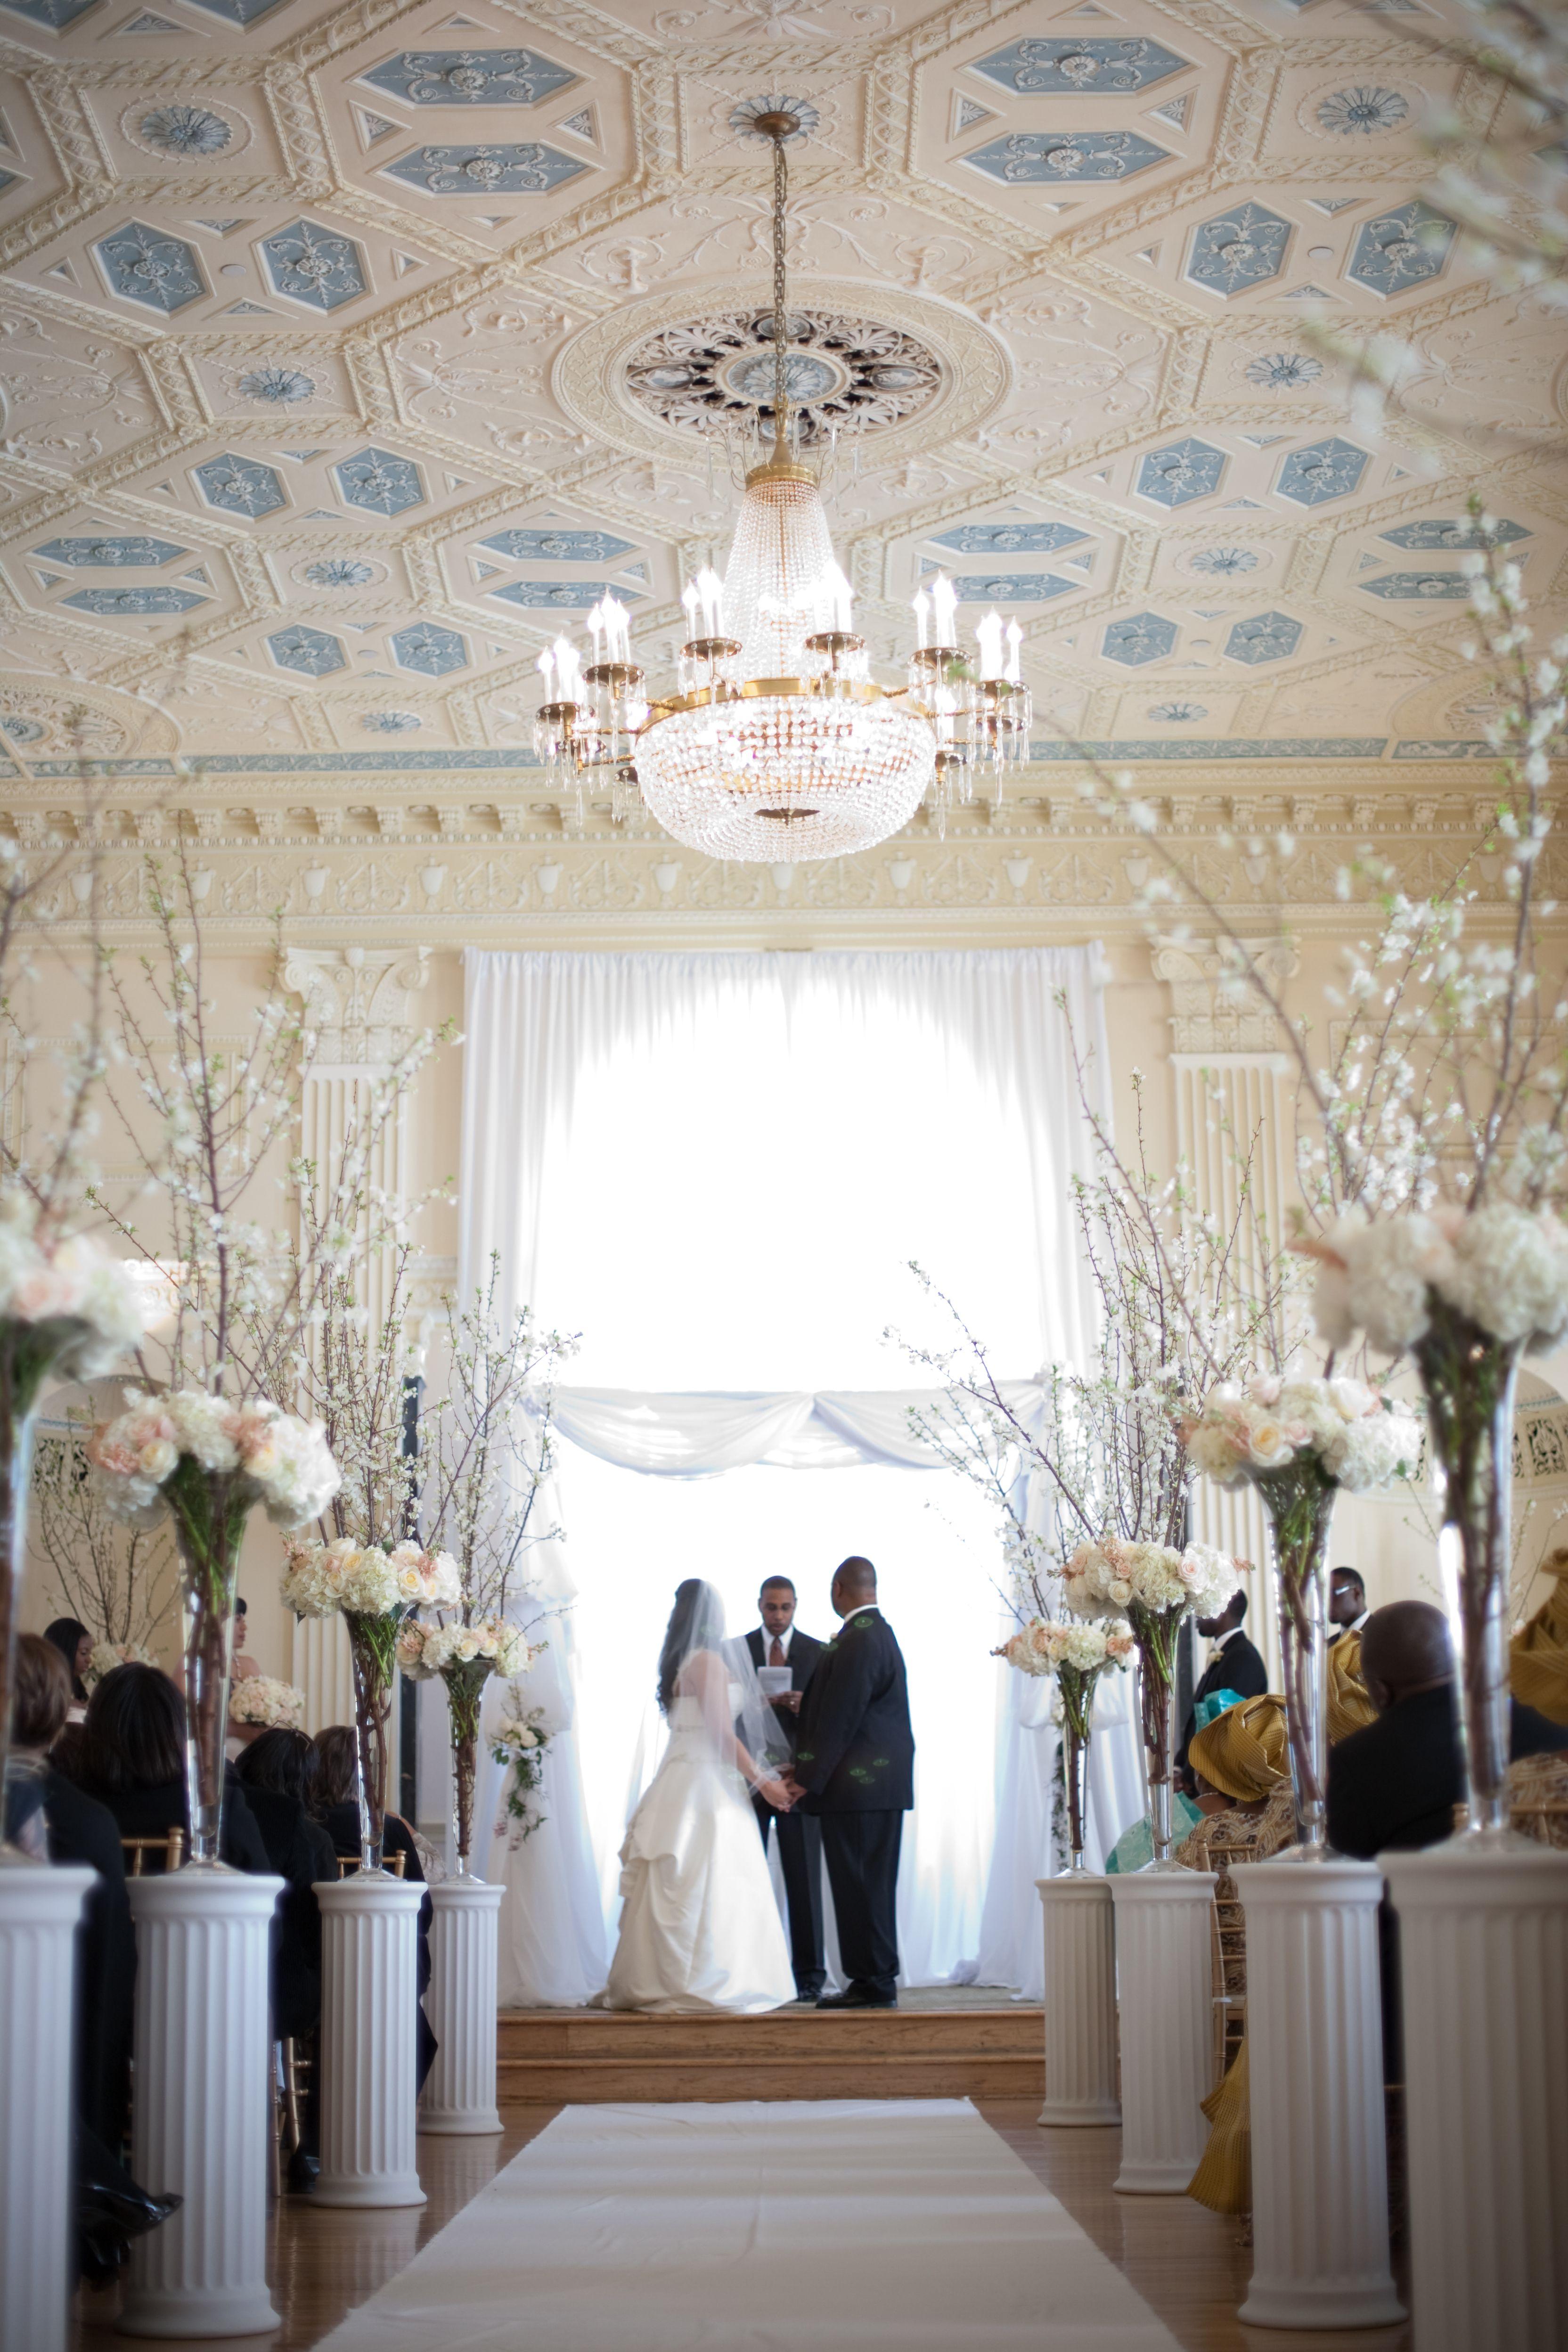 Atlanta Biltmore wedding - Ceremony Decorations - trumpet vases with ...